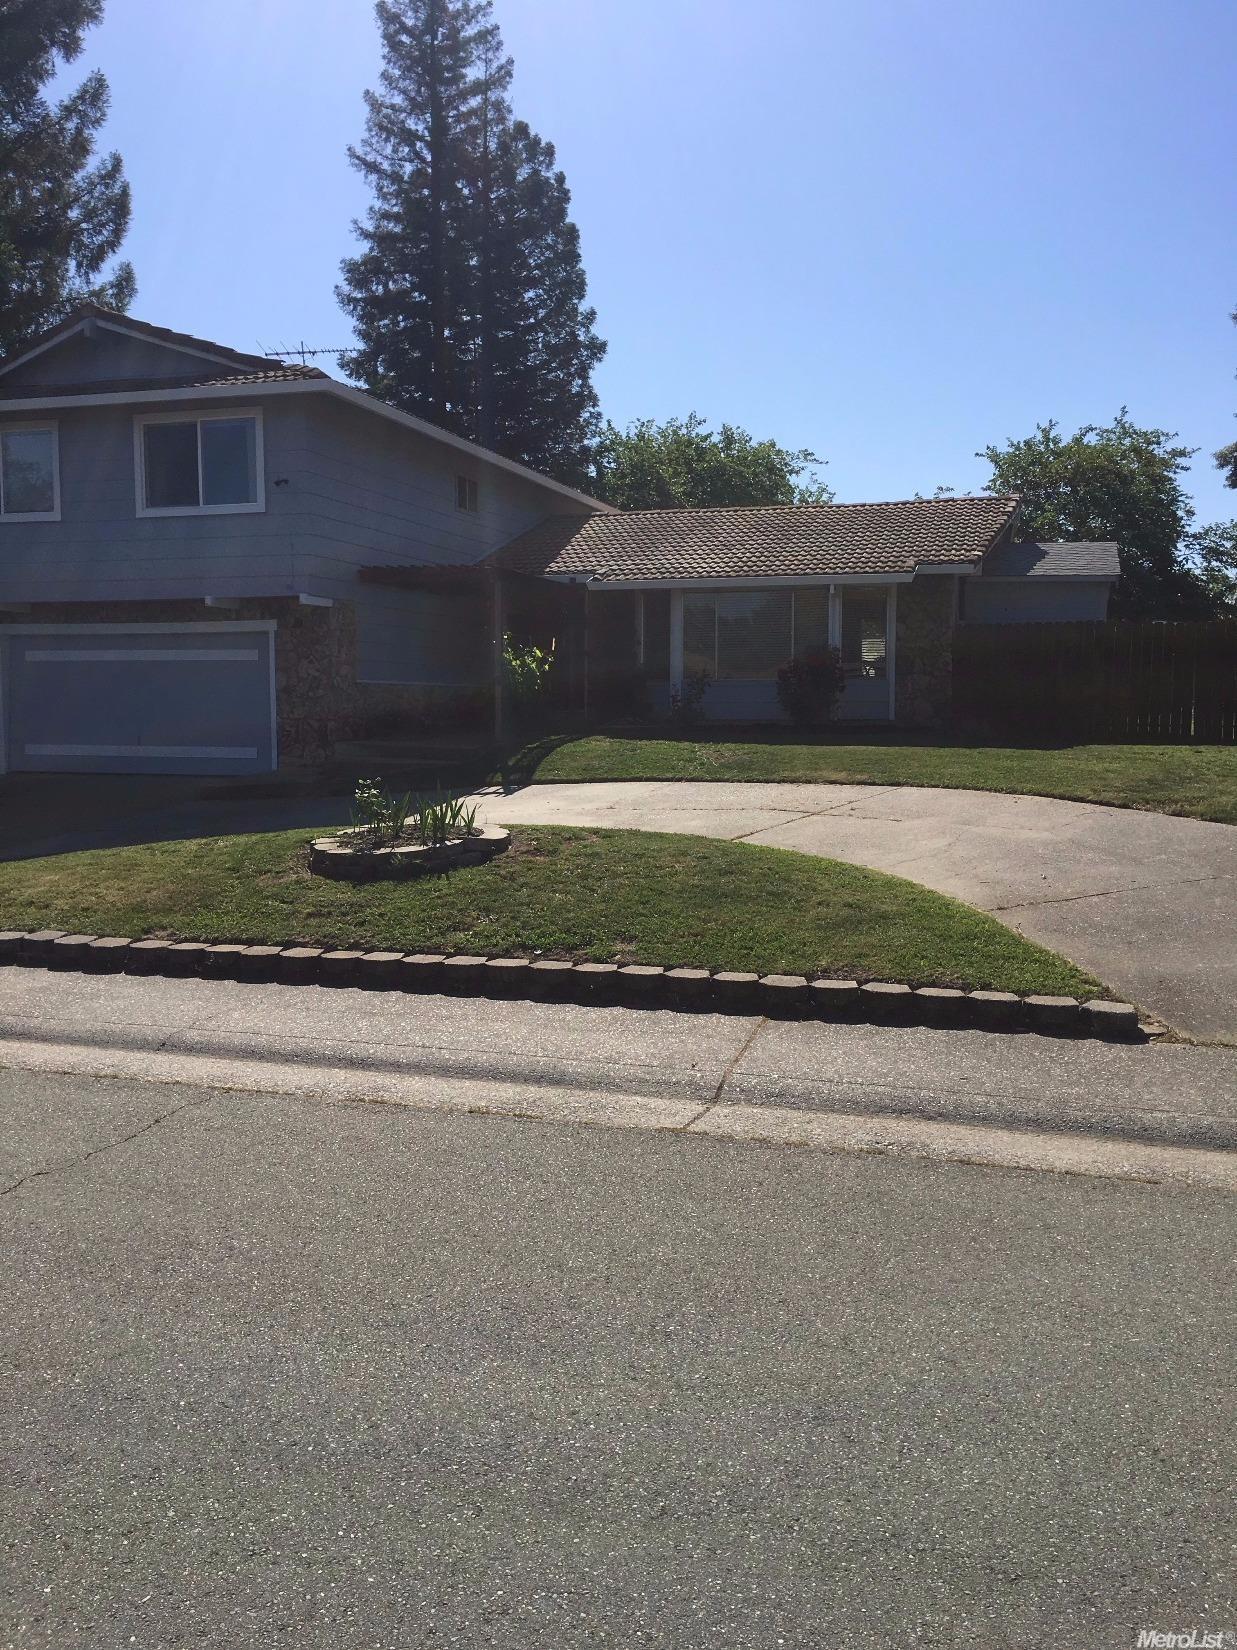 8320 Olivine Ave, Citrus Heights, CA